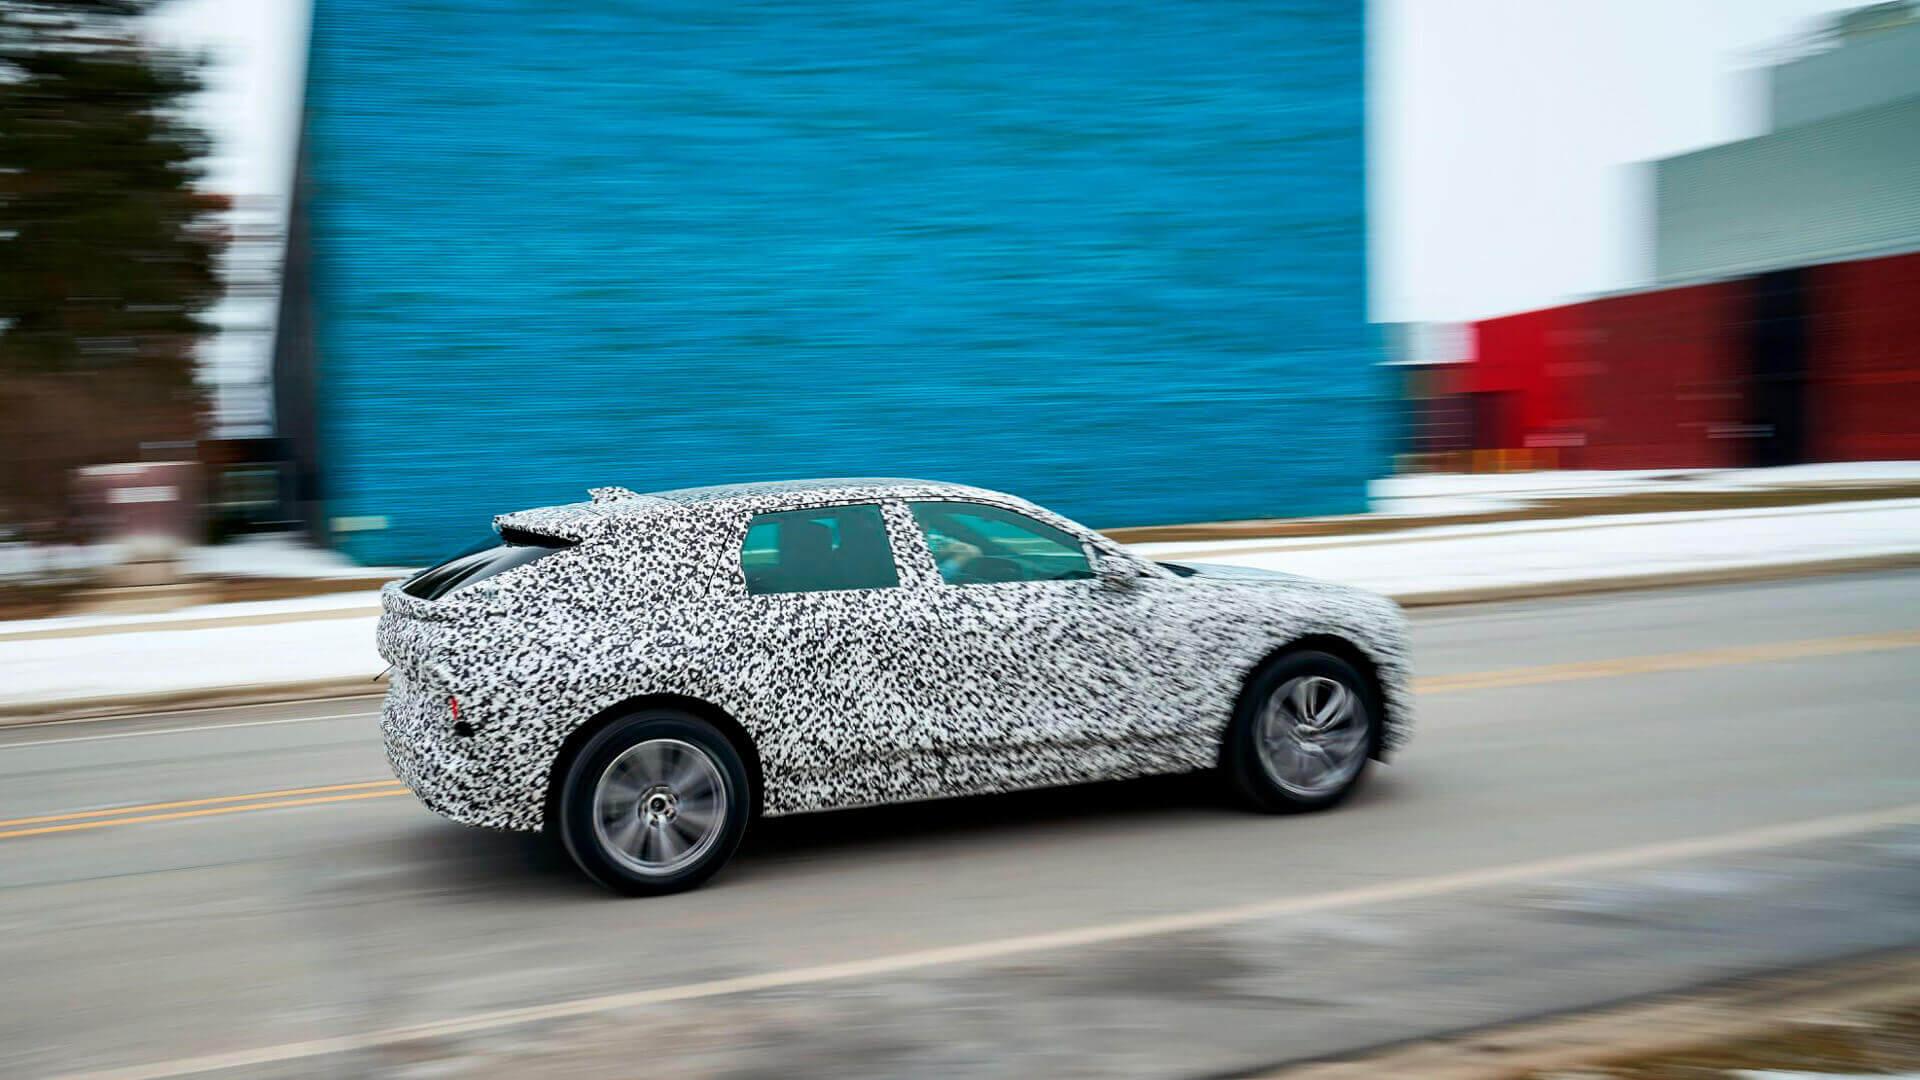 Cadillac Lyriq готовят к серийному запуску тестируя на полигоне GM